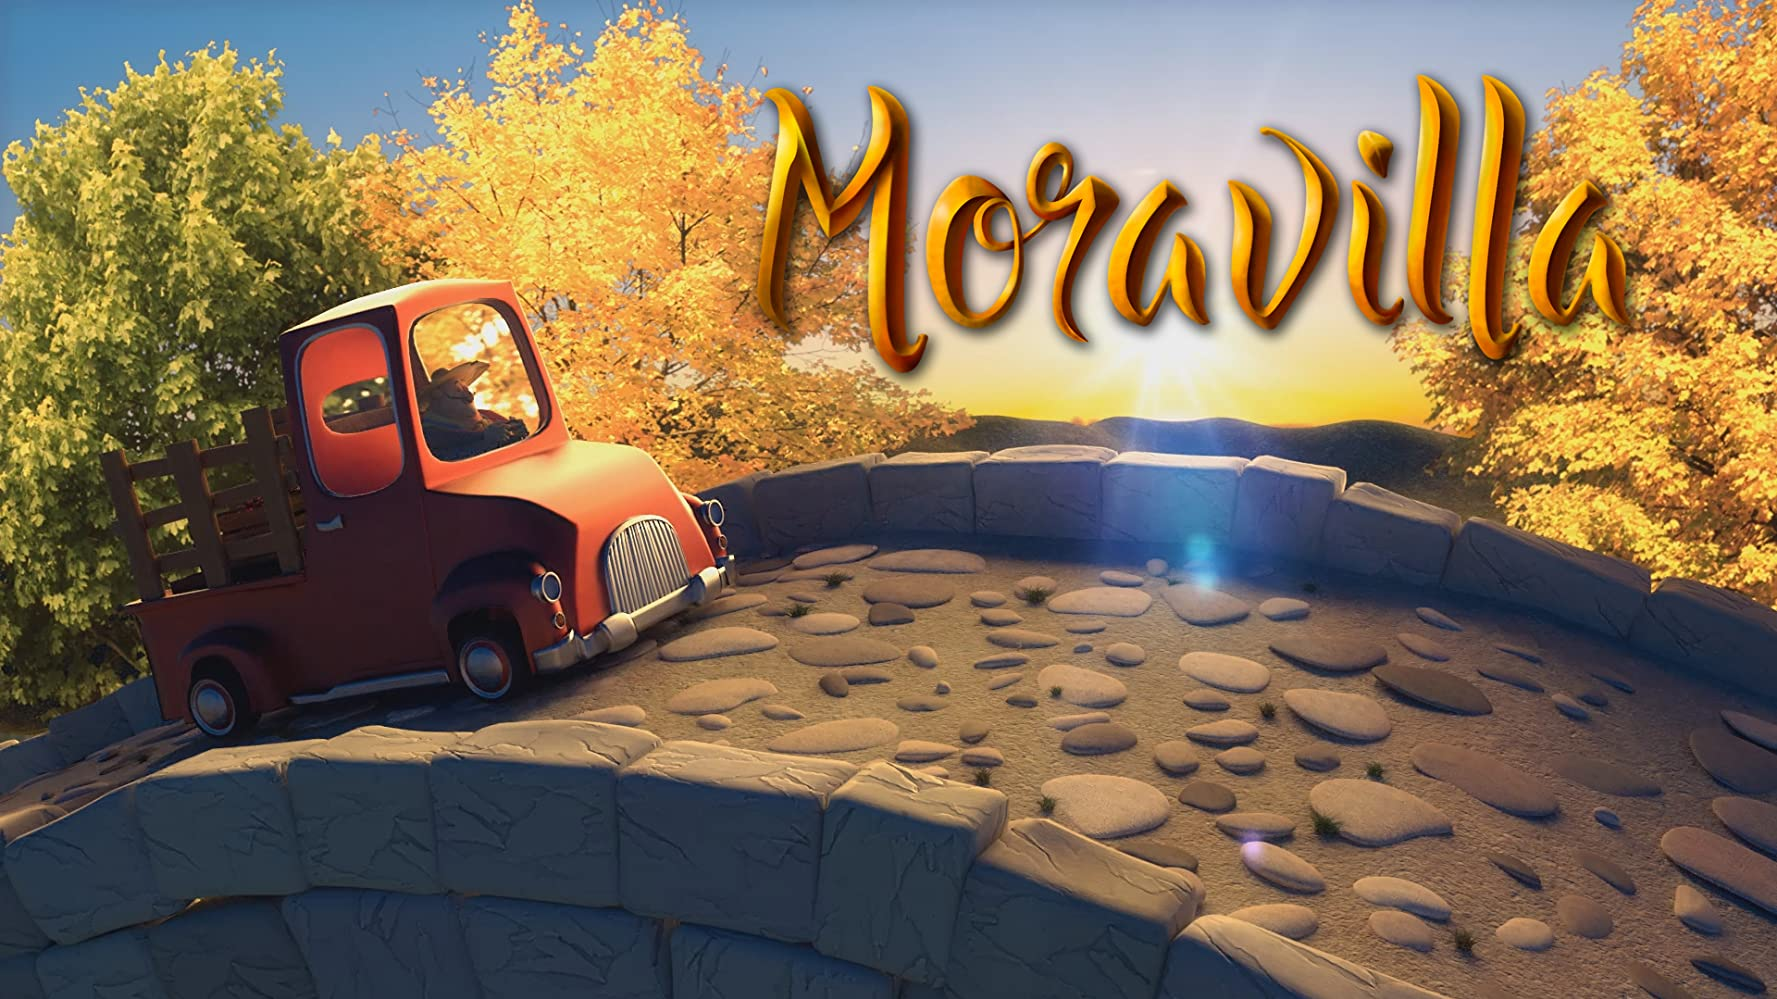 Moravilla